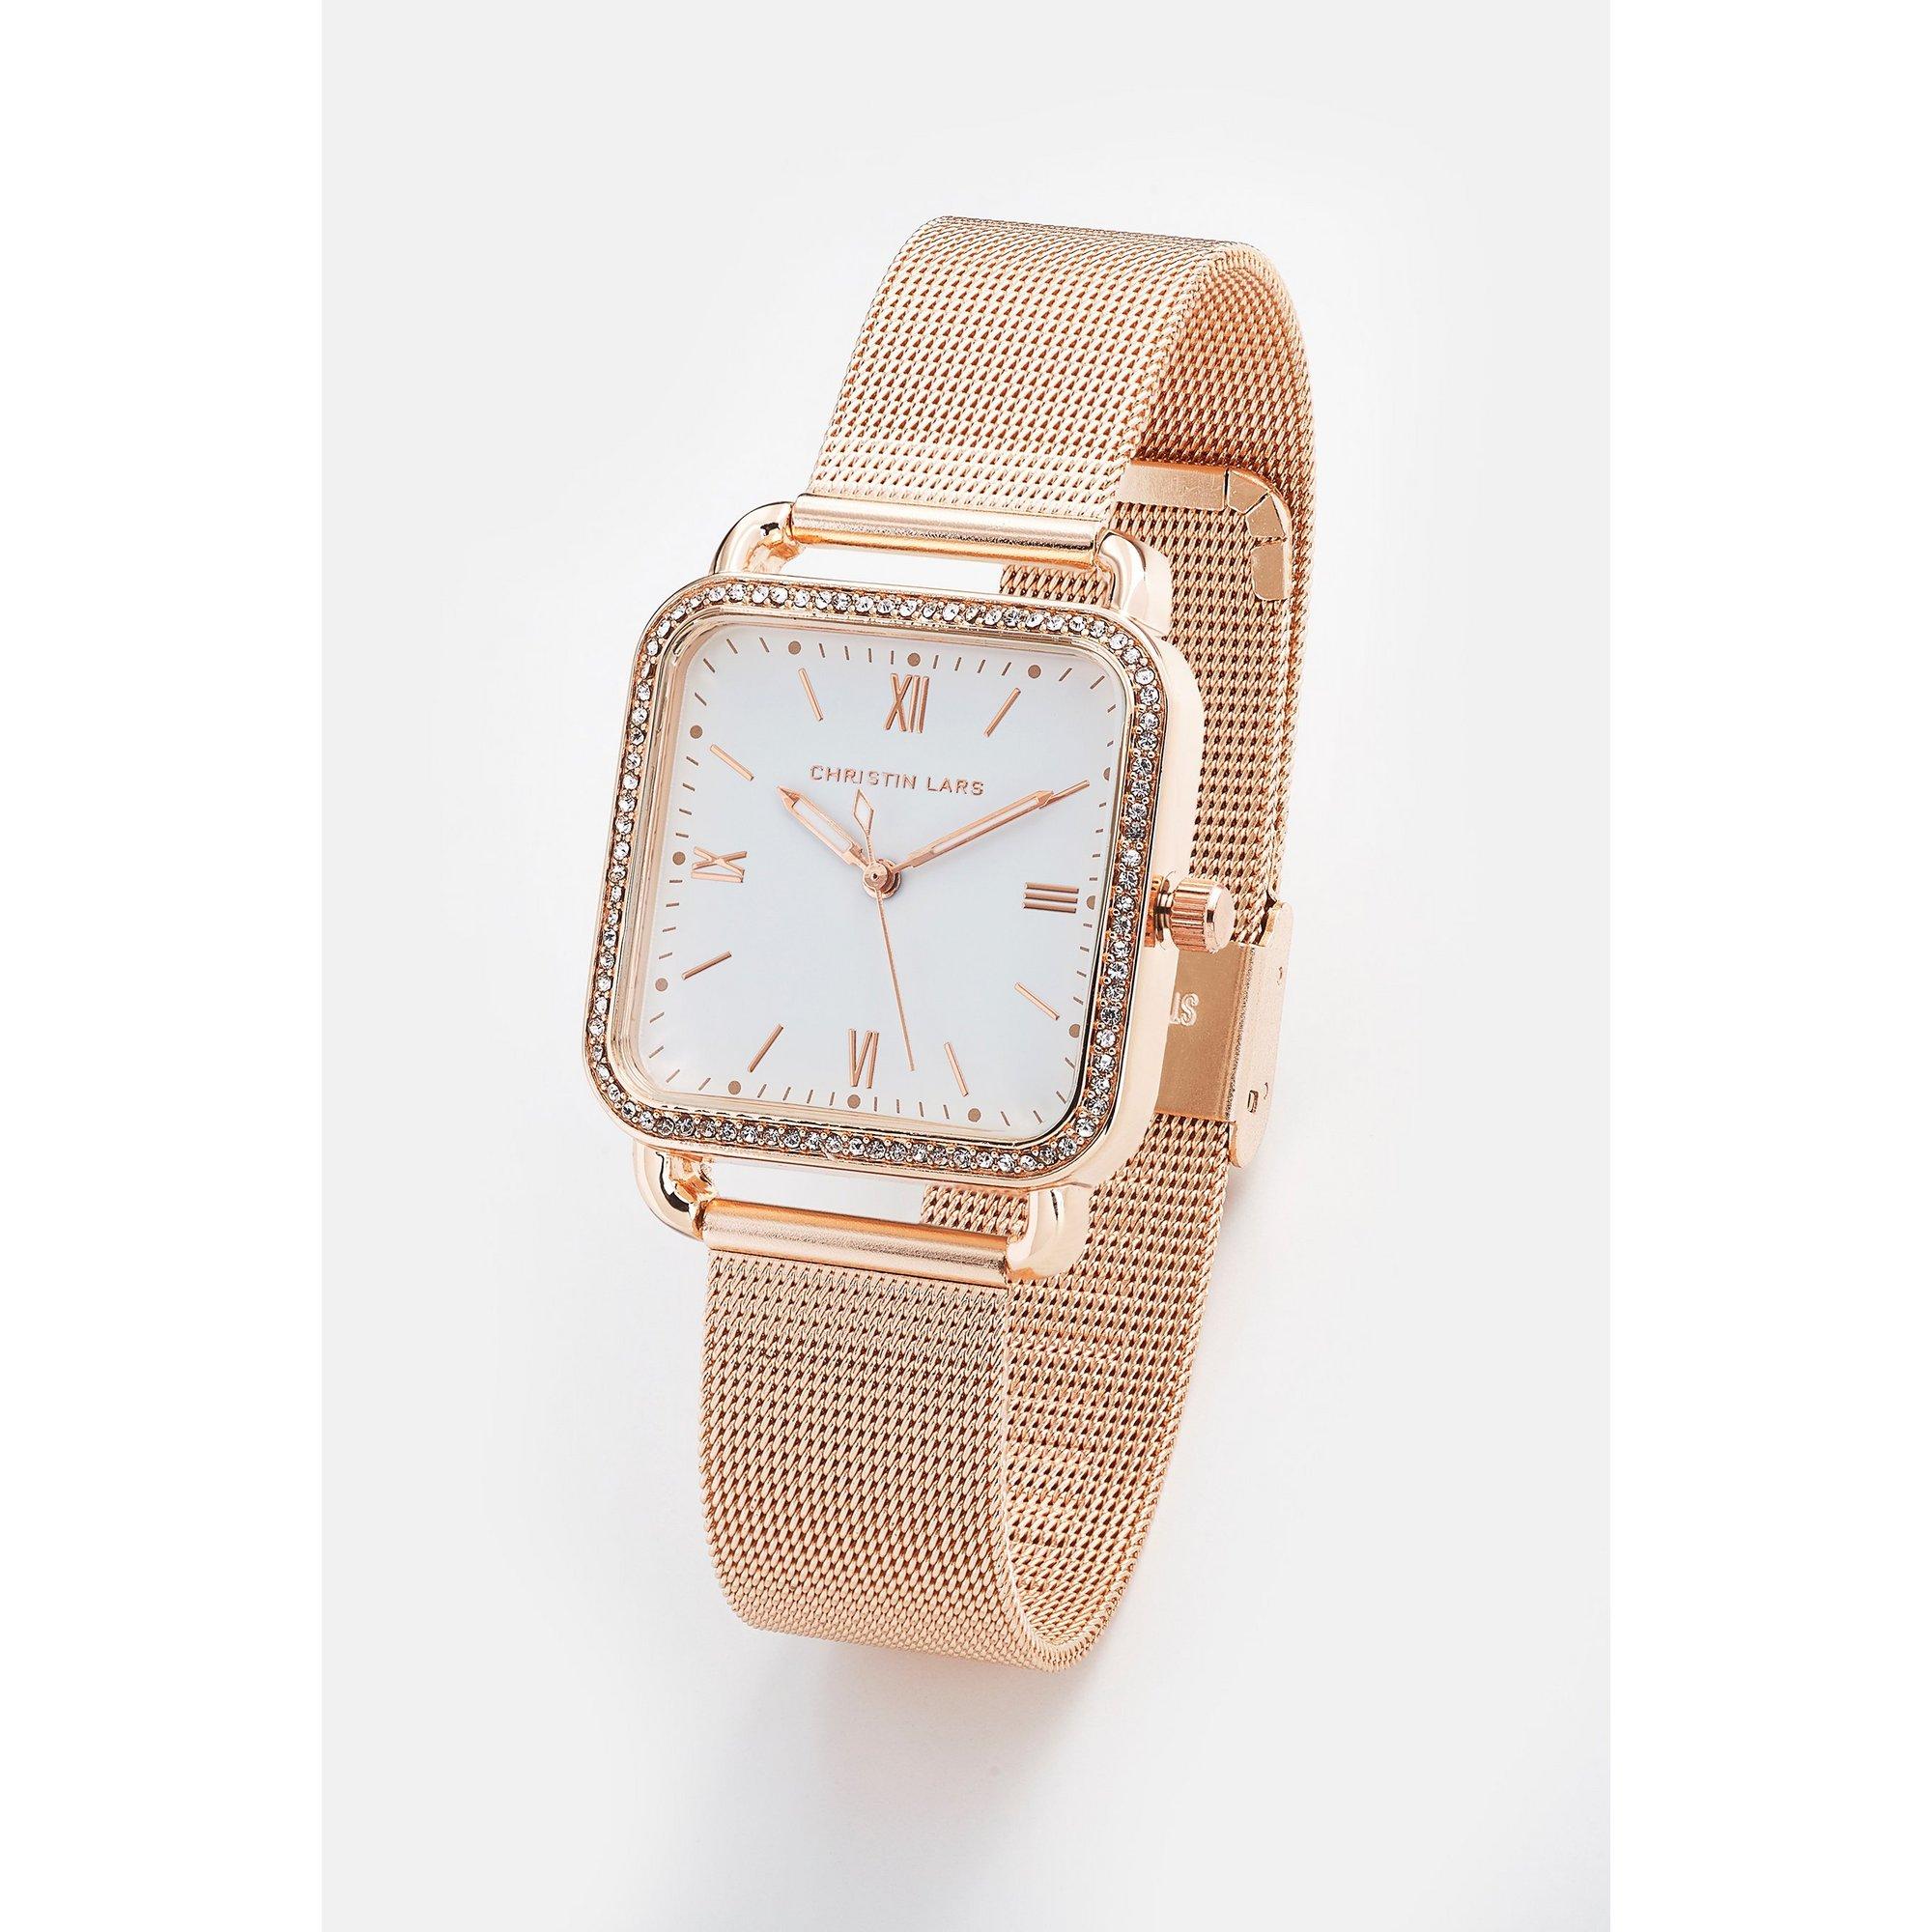 Image of Christin Lars Gold Tone Bracelet Watch